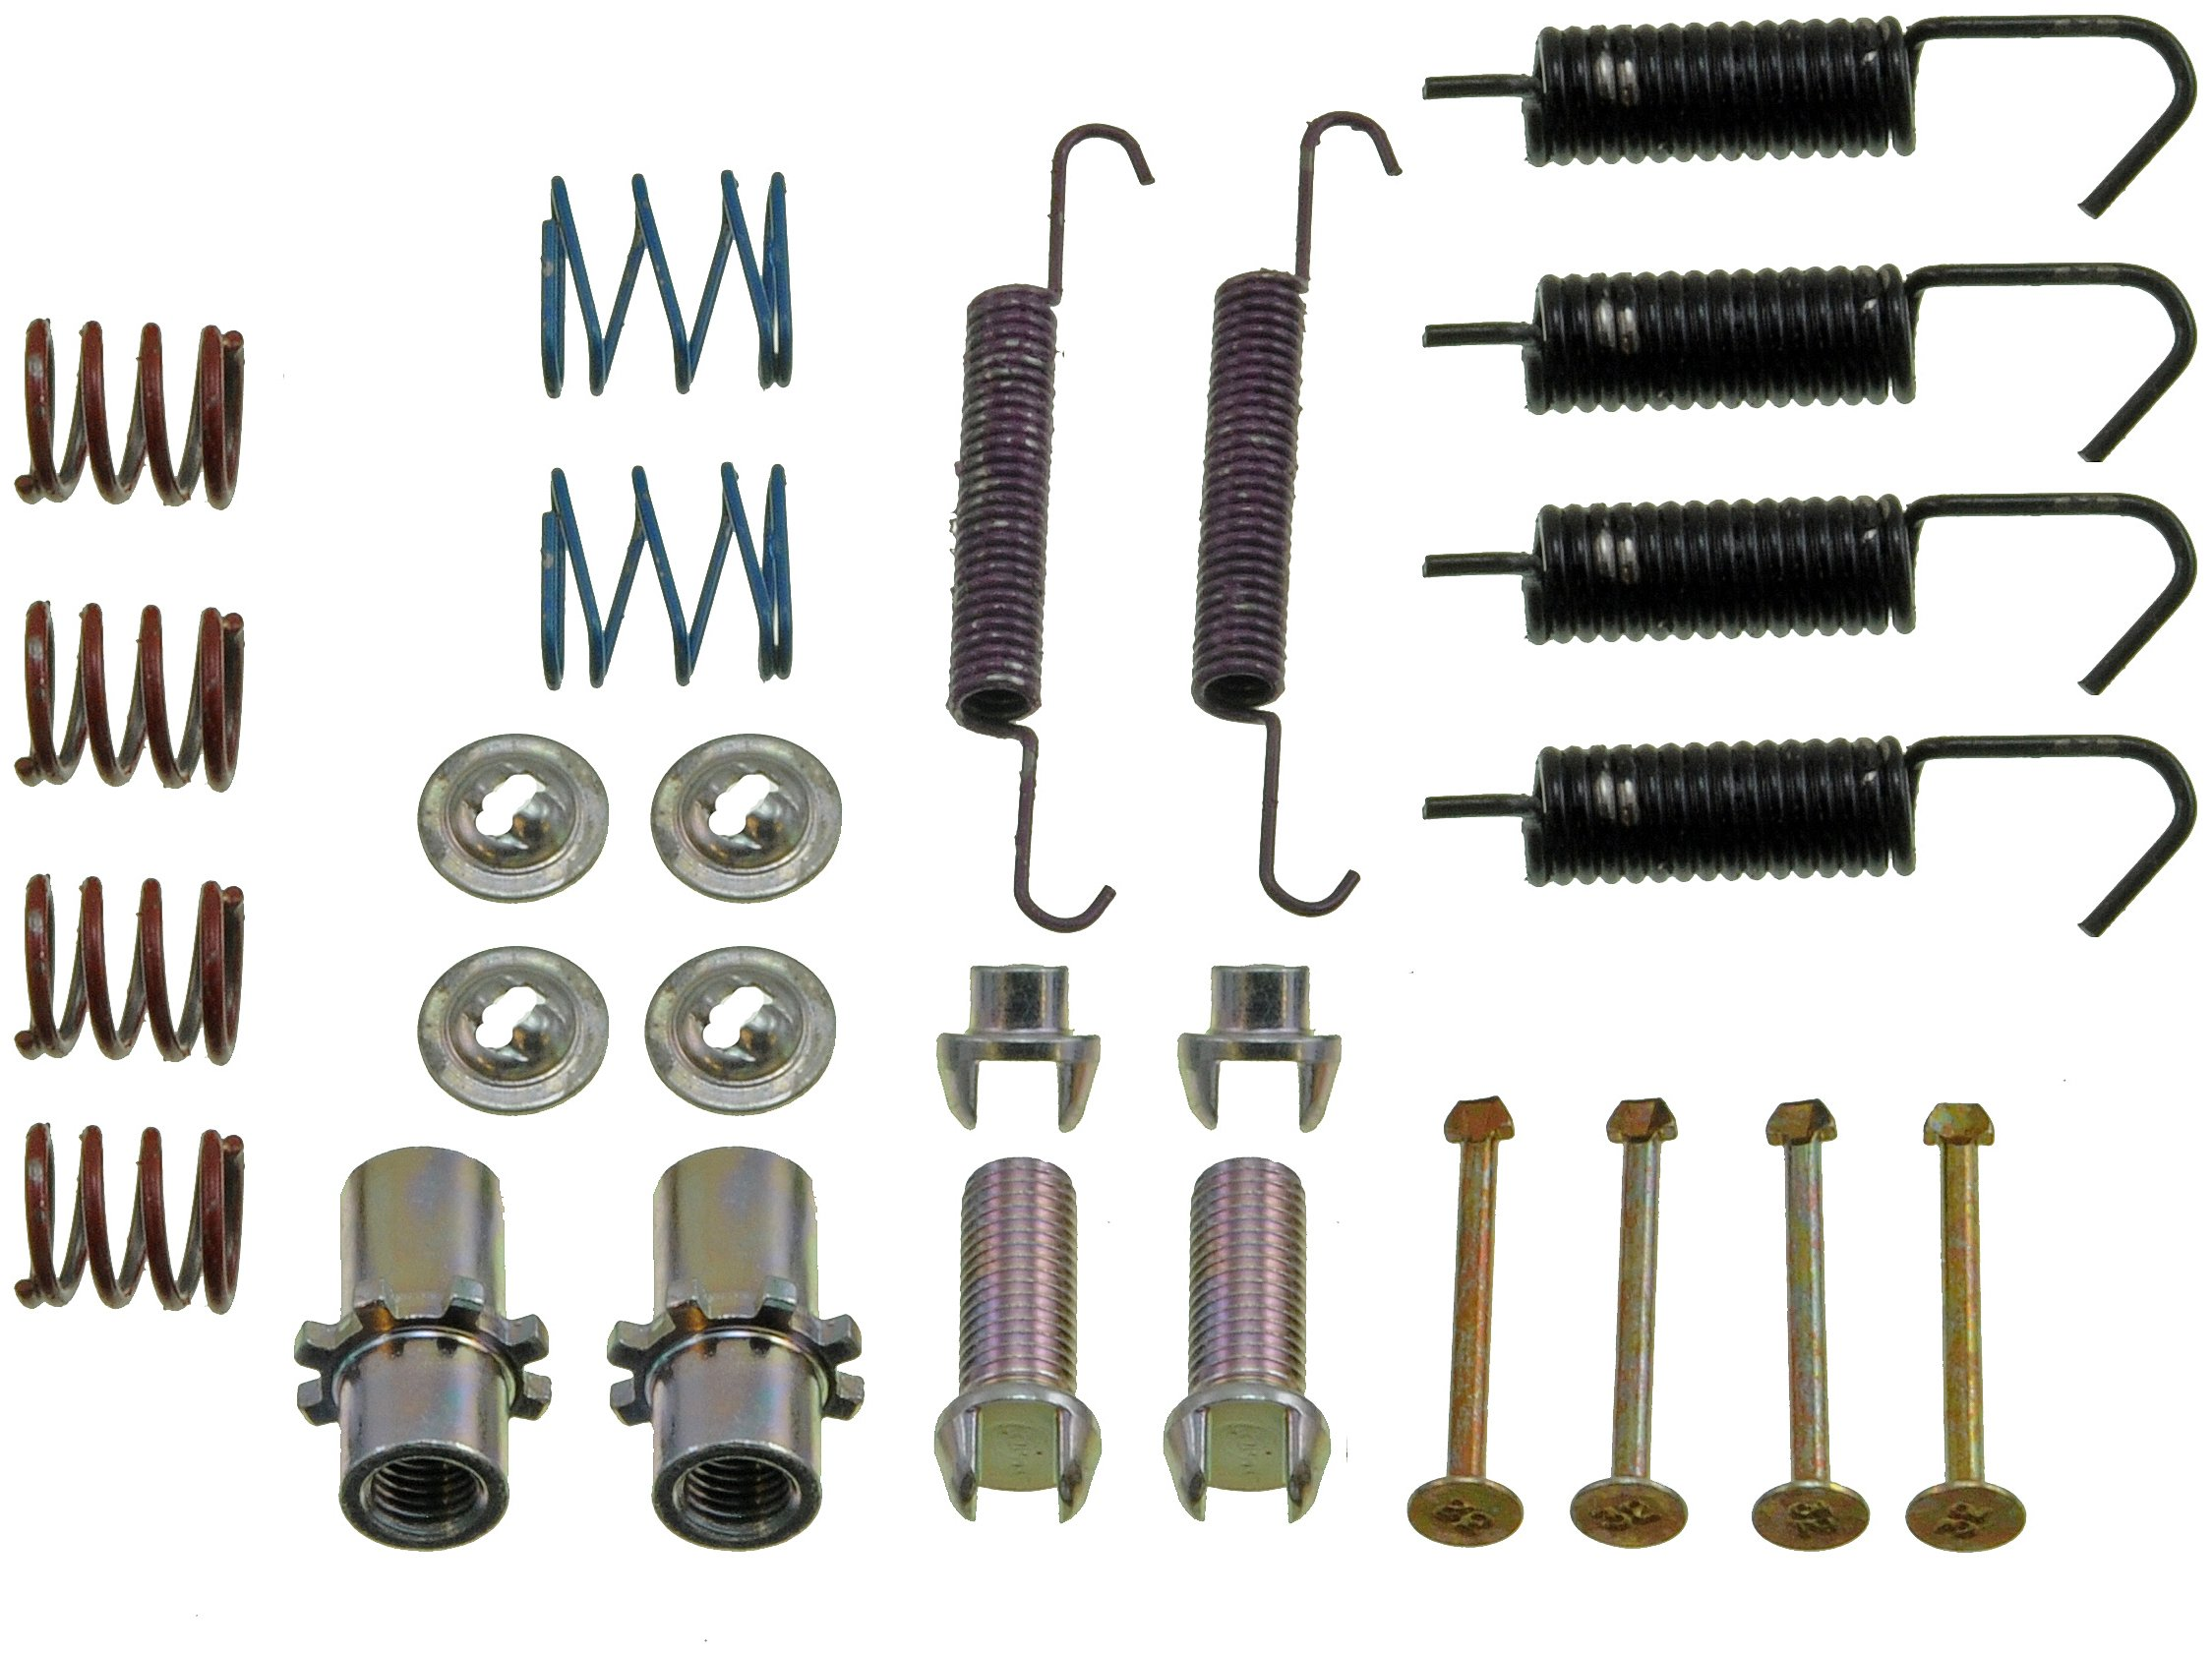 Dorman HW17399 Parking Brake Hardware Kit